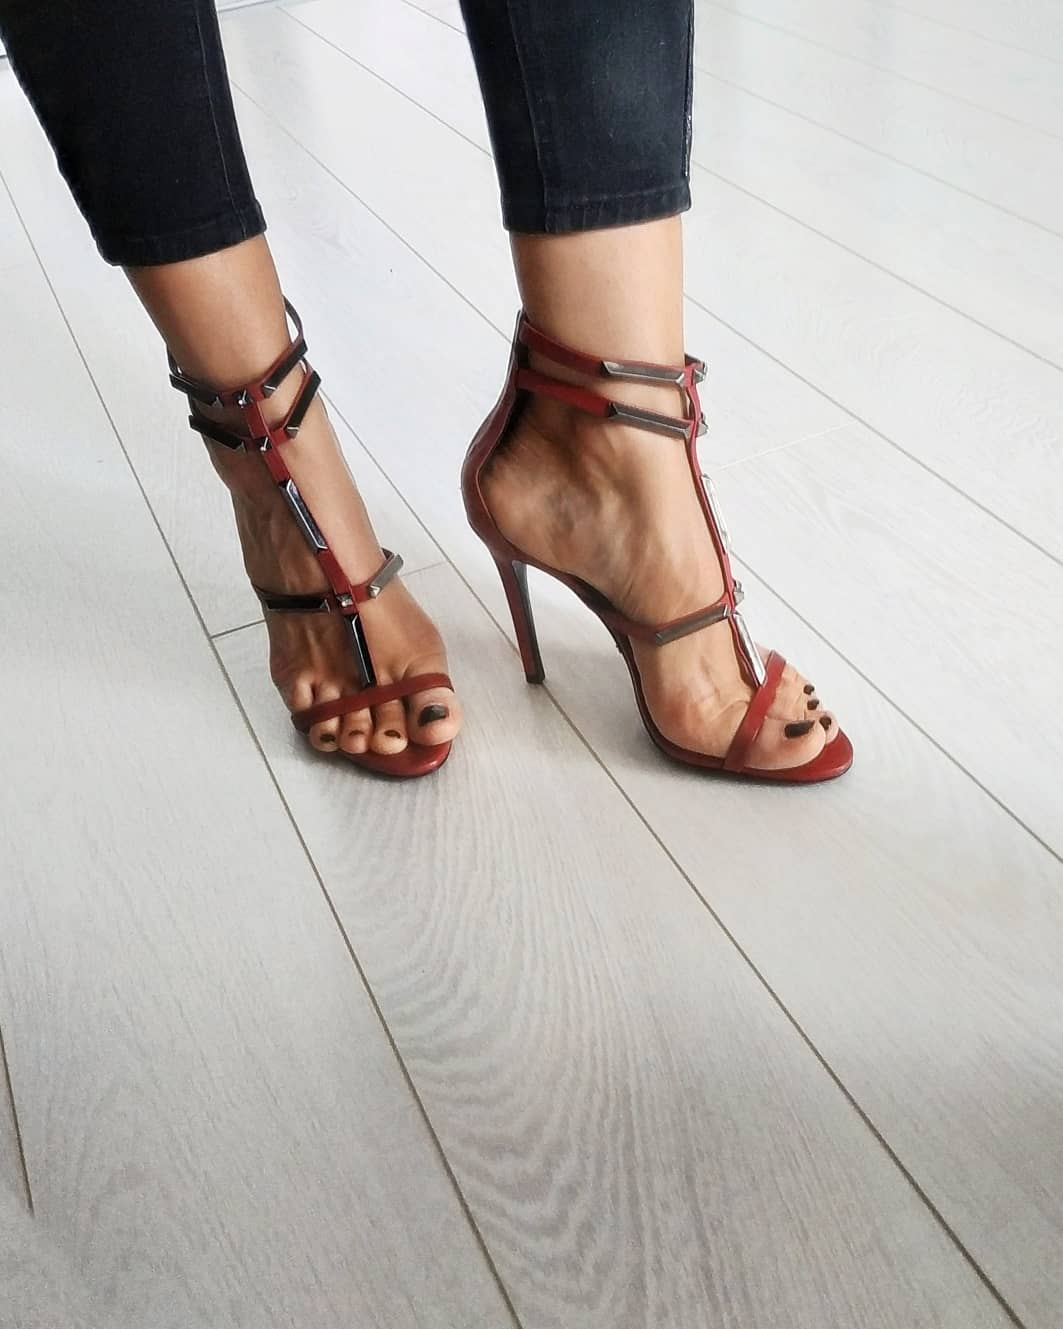 pantofi-cu-toc-sandale-inalte